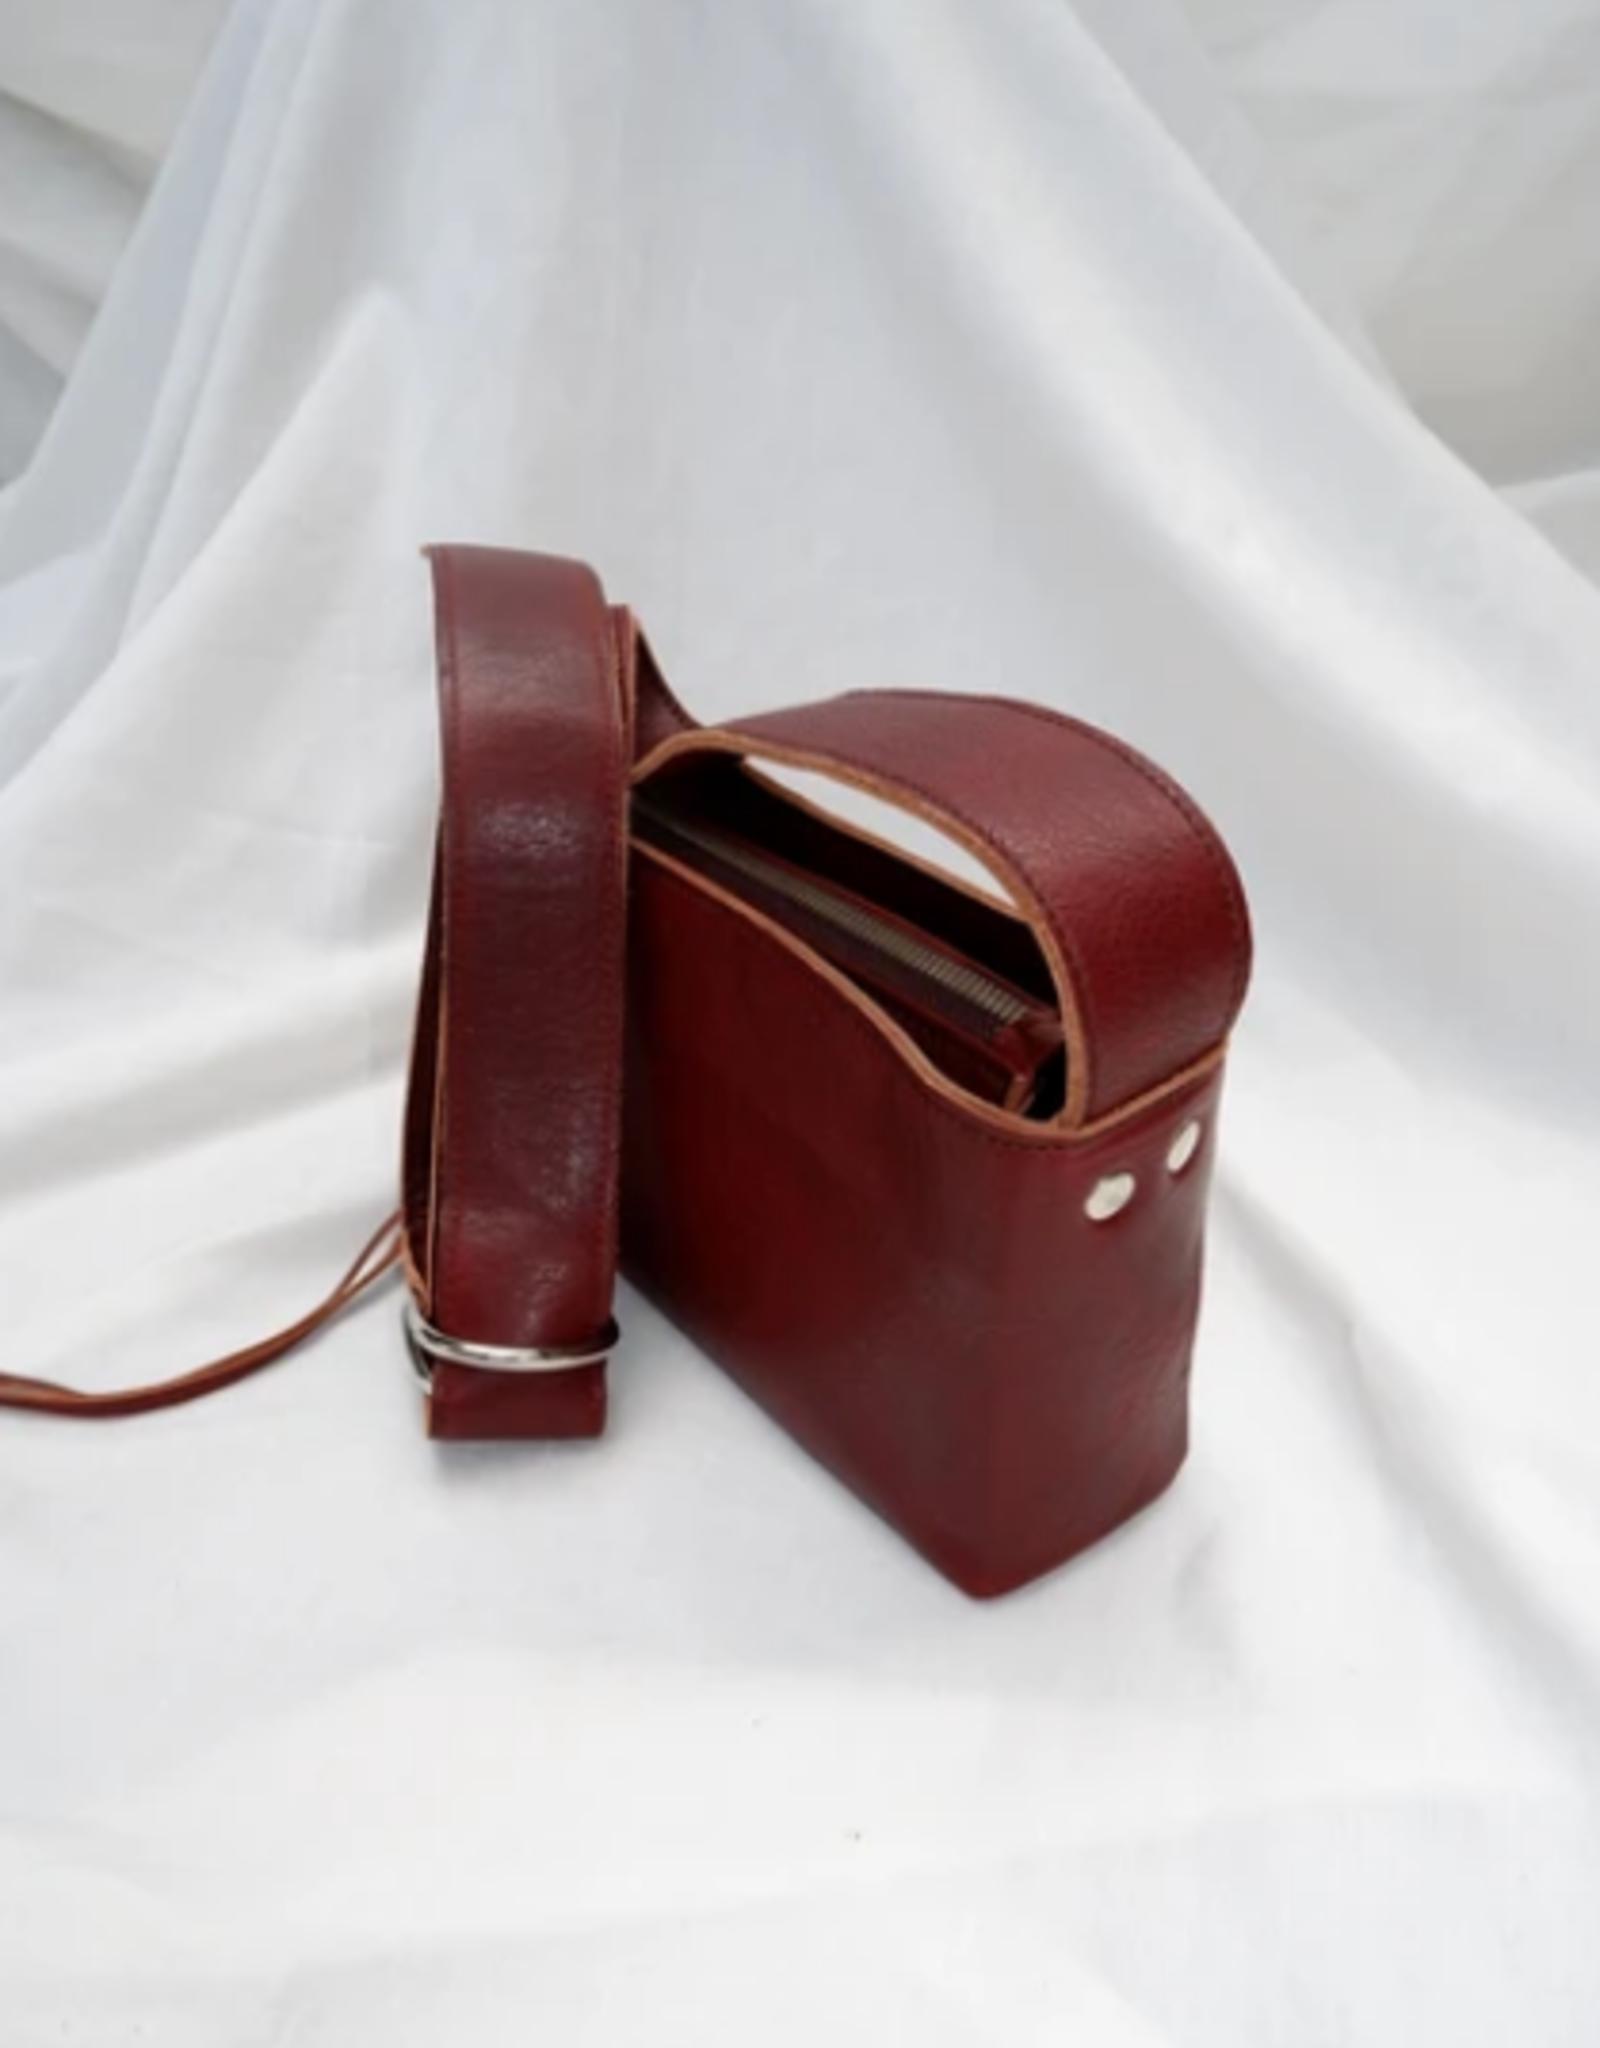 Nona Nona Box bag chocolat